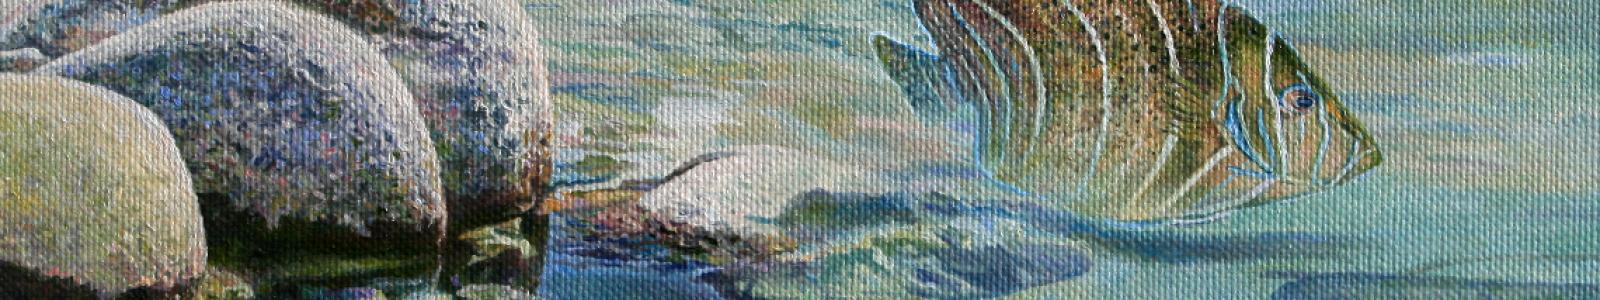 Gallery Painter Alexander Shinkarenko